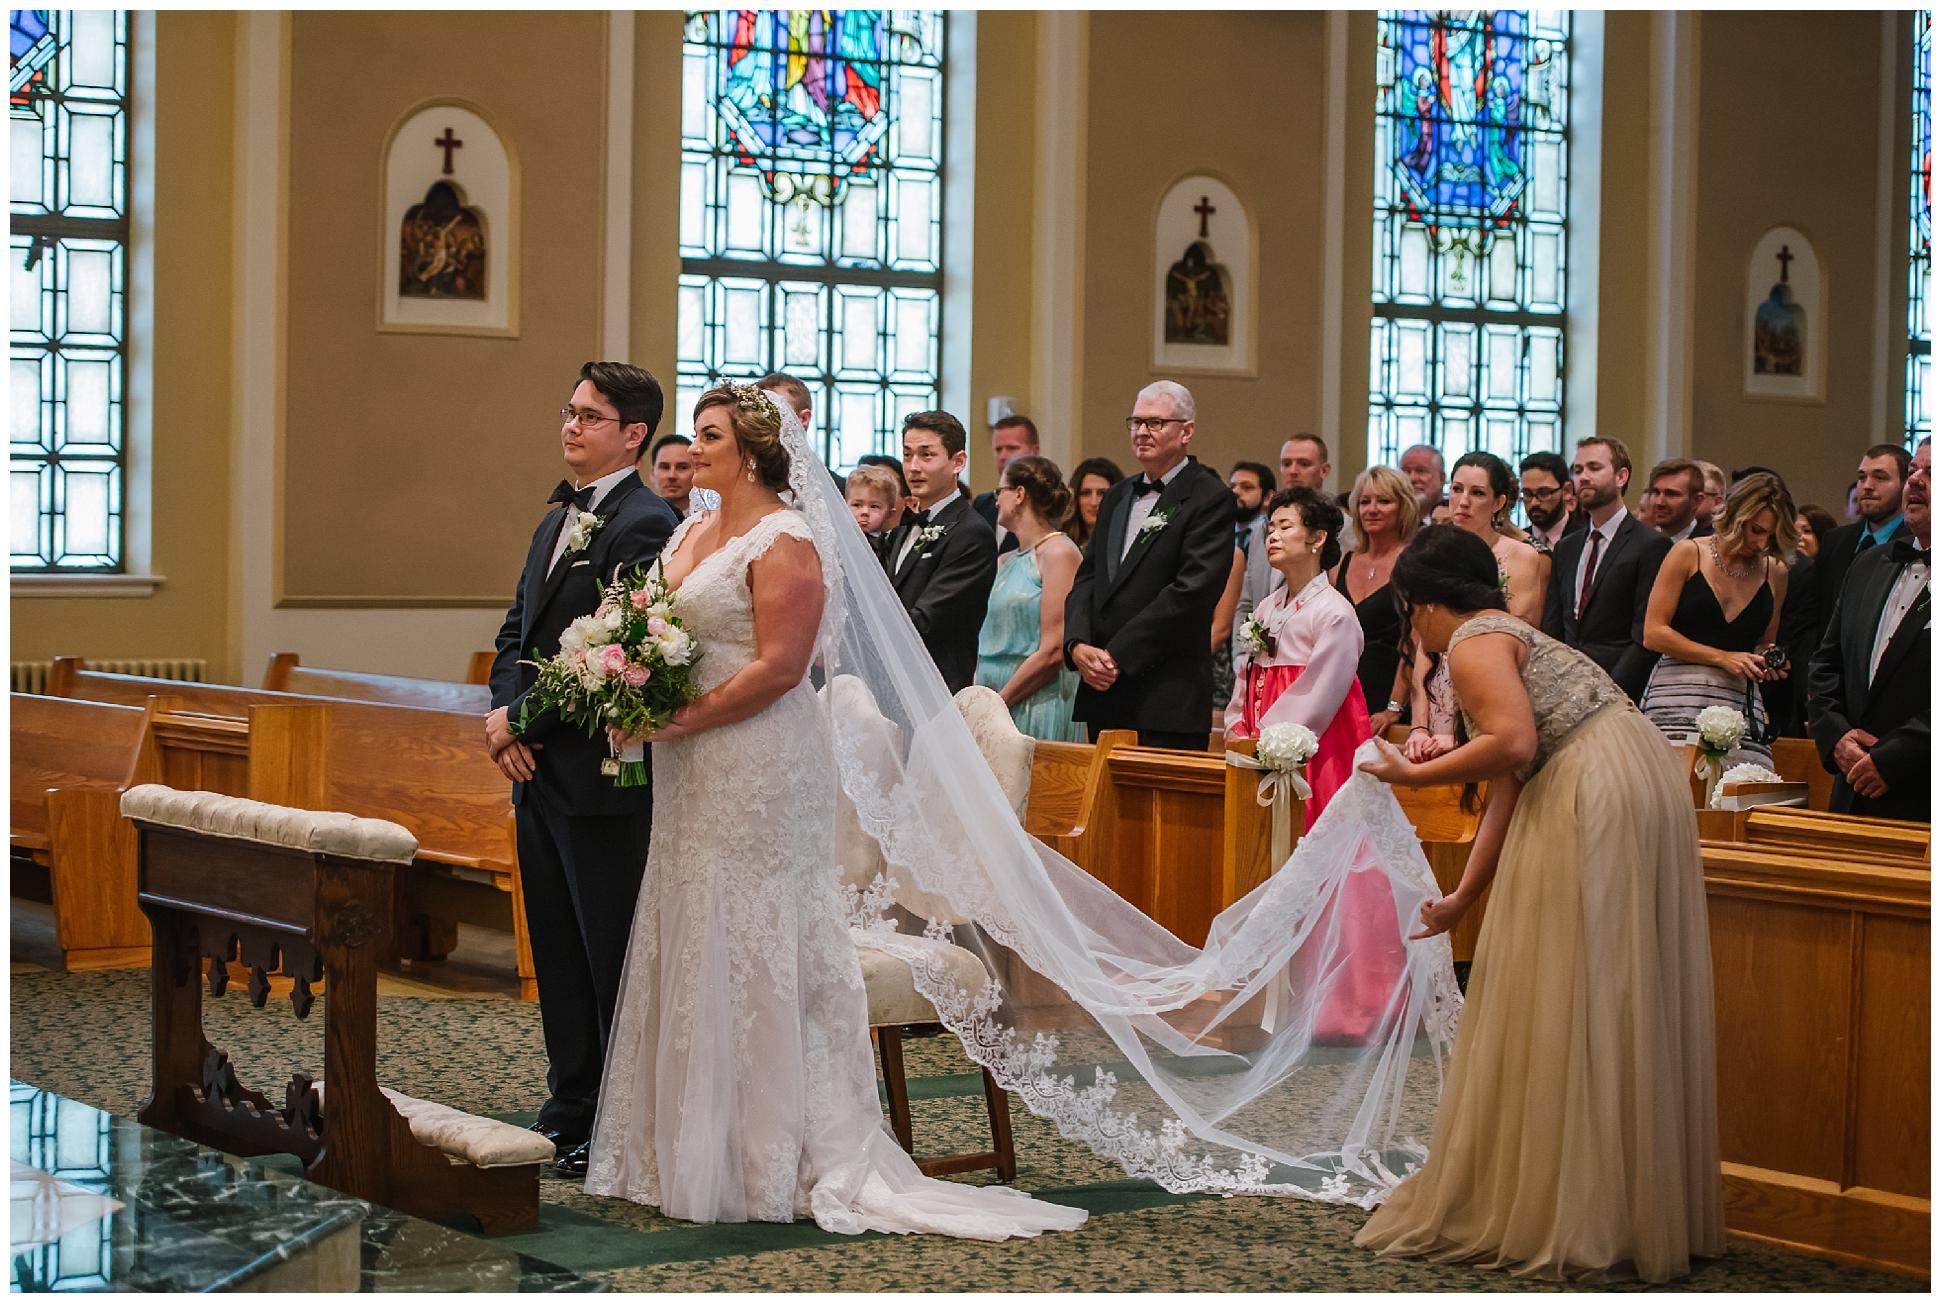 st-pete-wedding-photographer-italian-romance-theme-rustic-flower-crown_0396.jpg